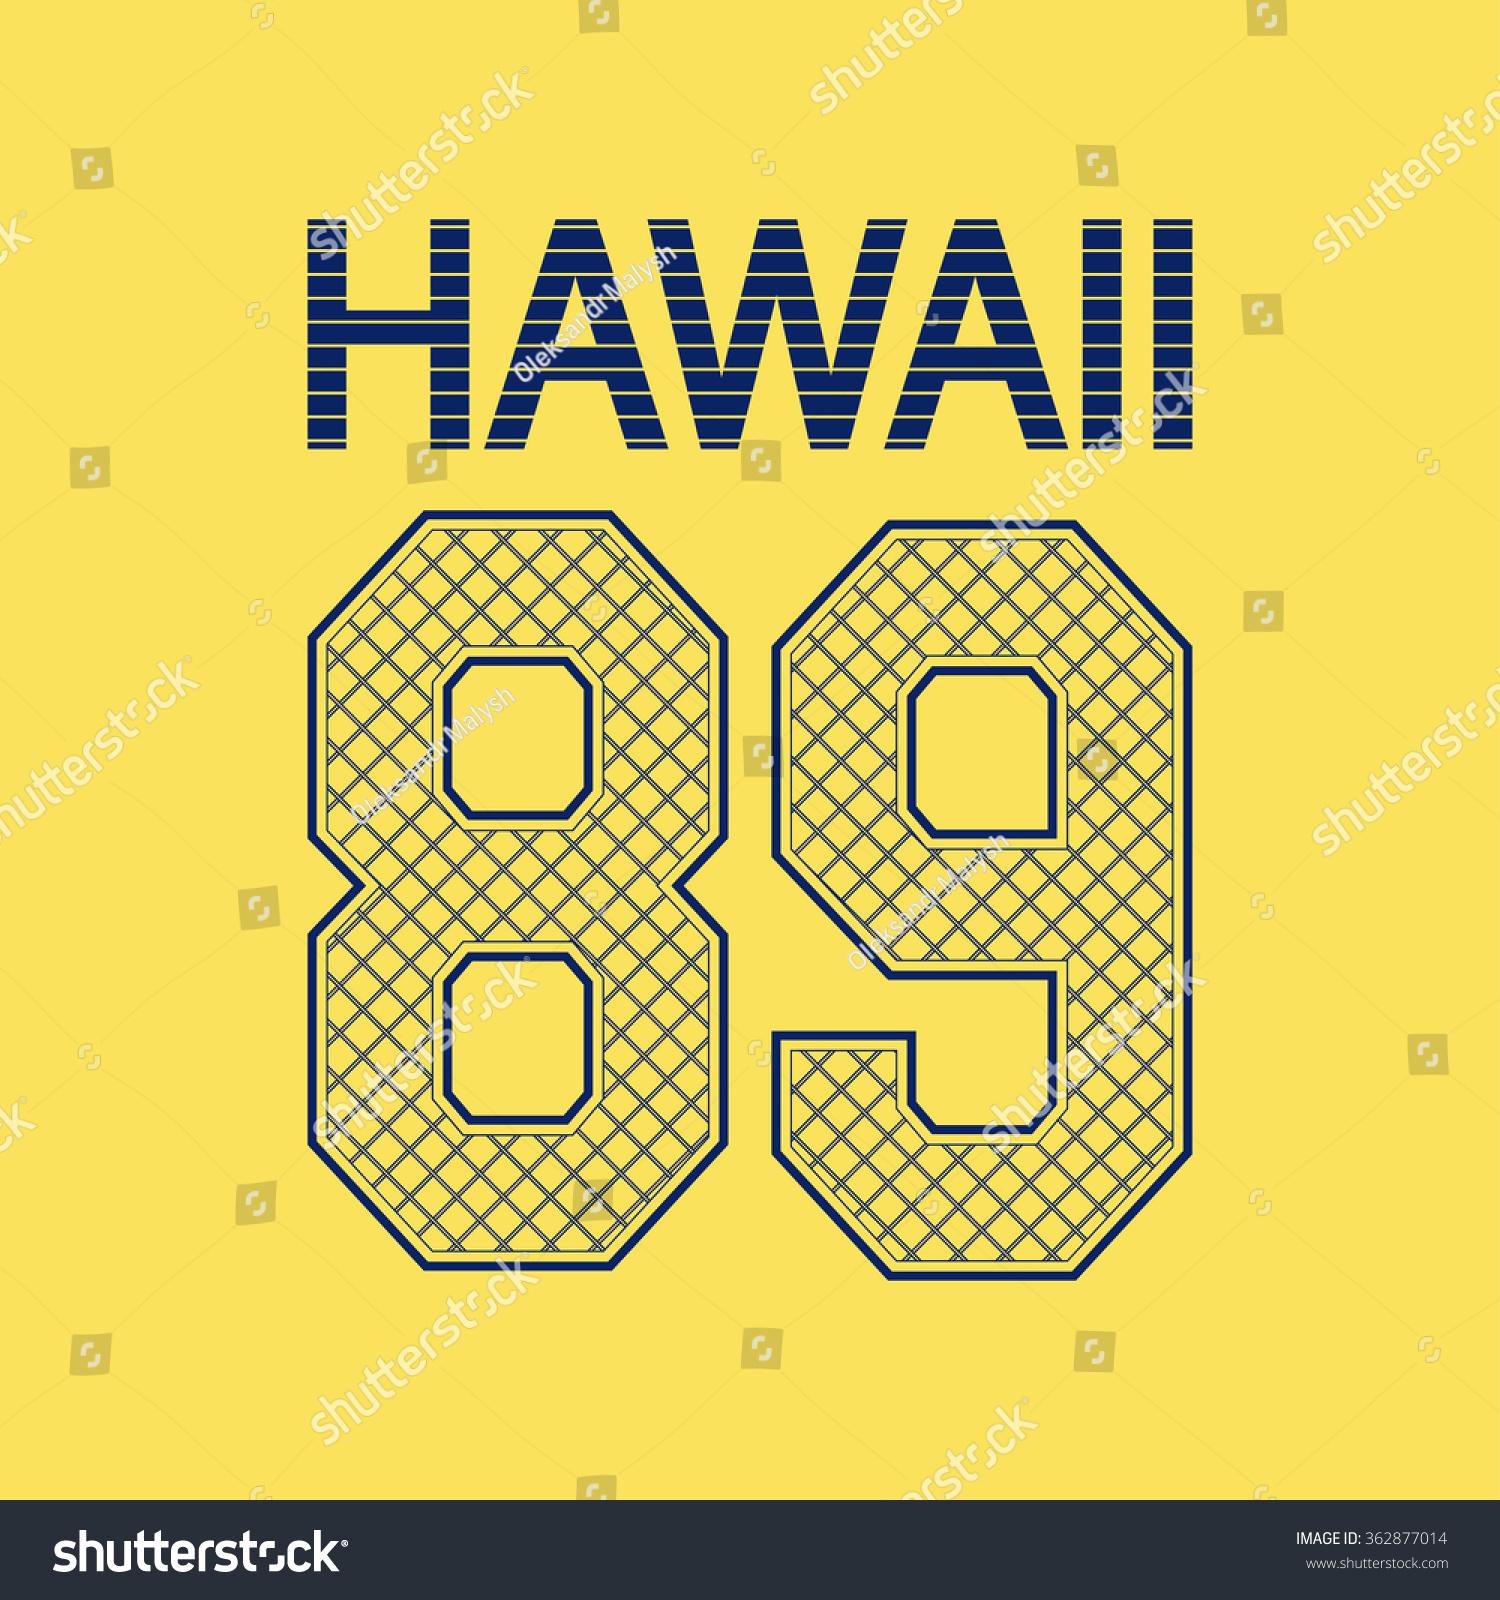 T shirt design hawaii - Hawaii Beach Typography T Shirt Design